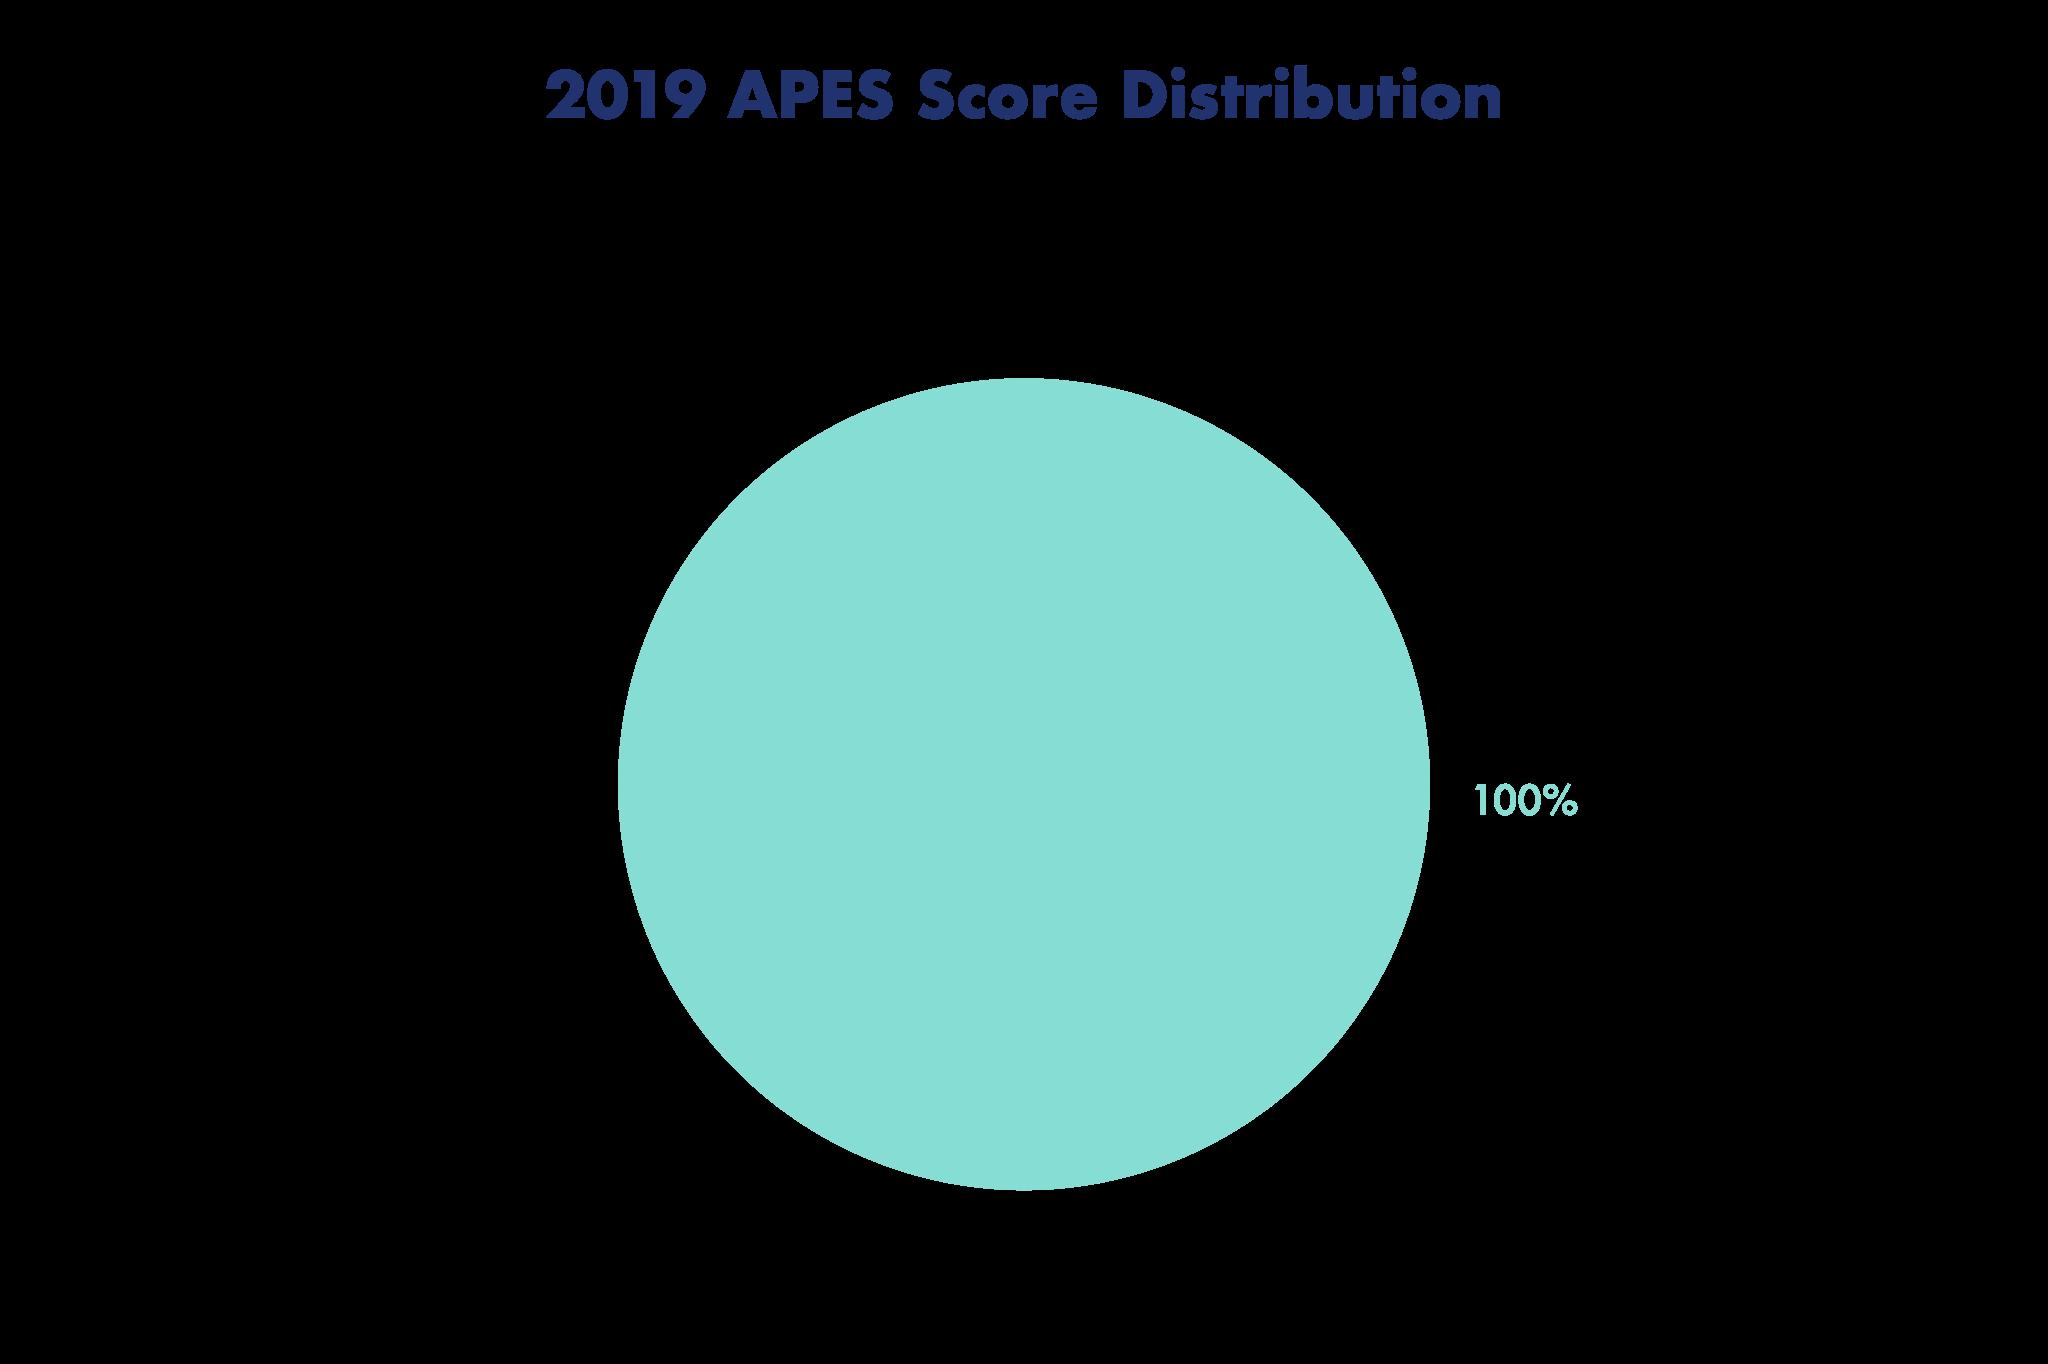 2019 APES Score Distribution